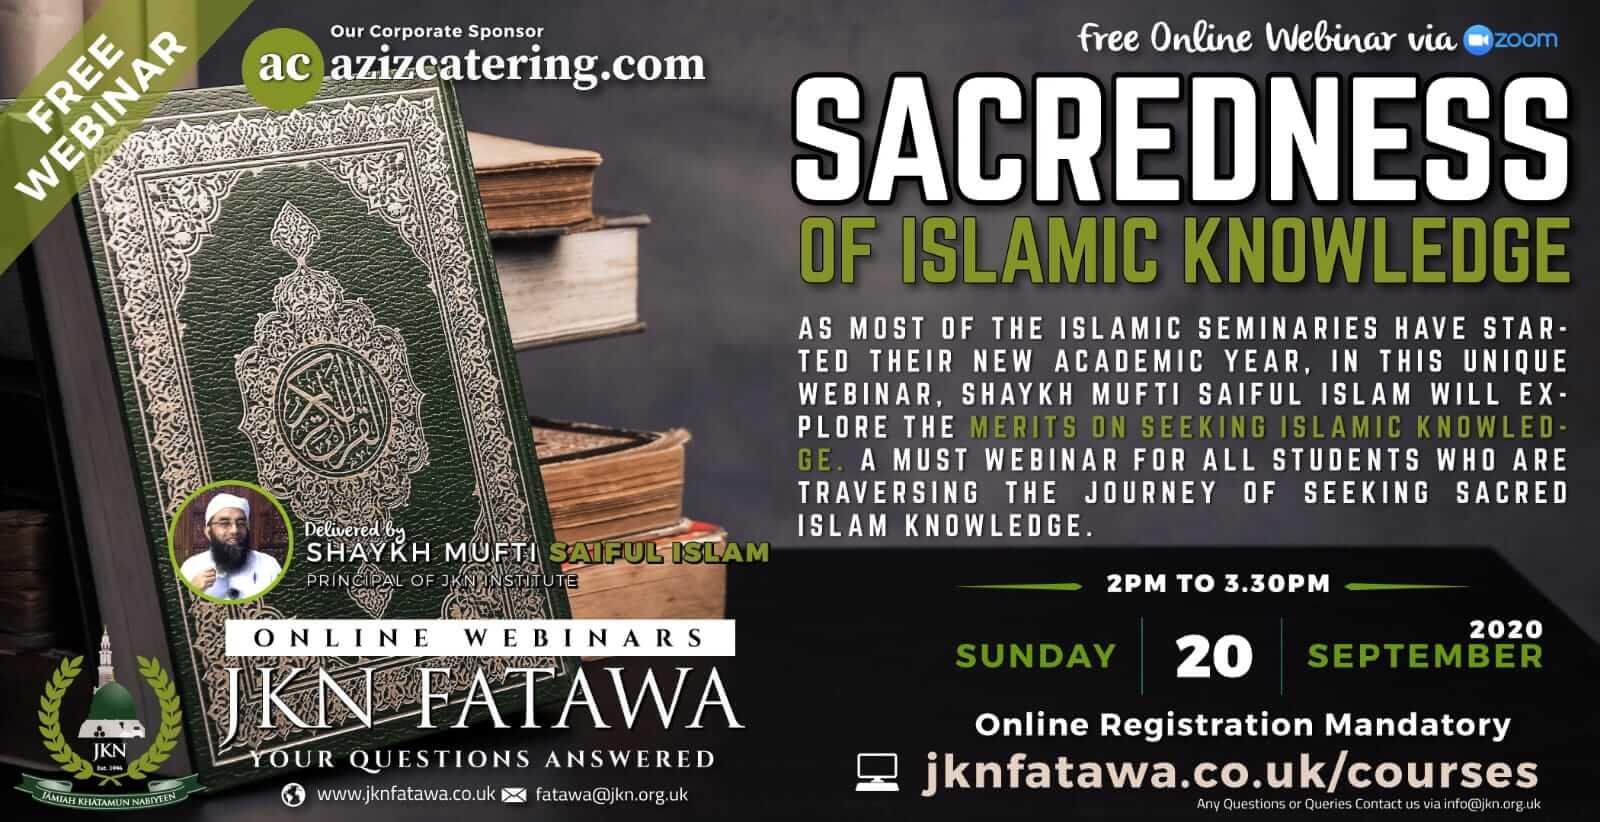 Sacredness Of Islamic Knowledge